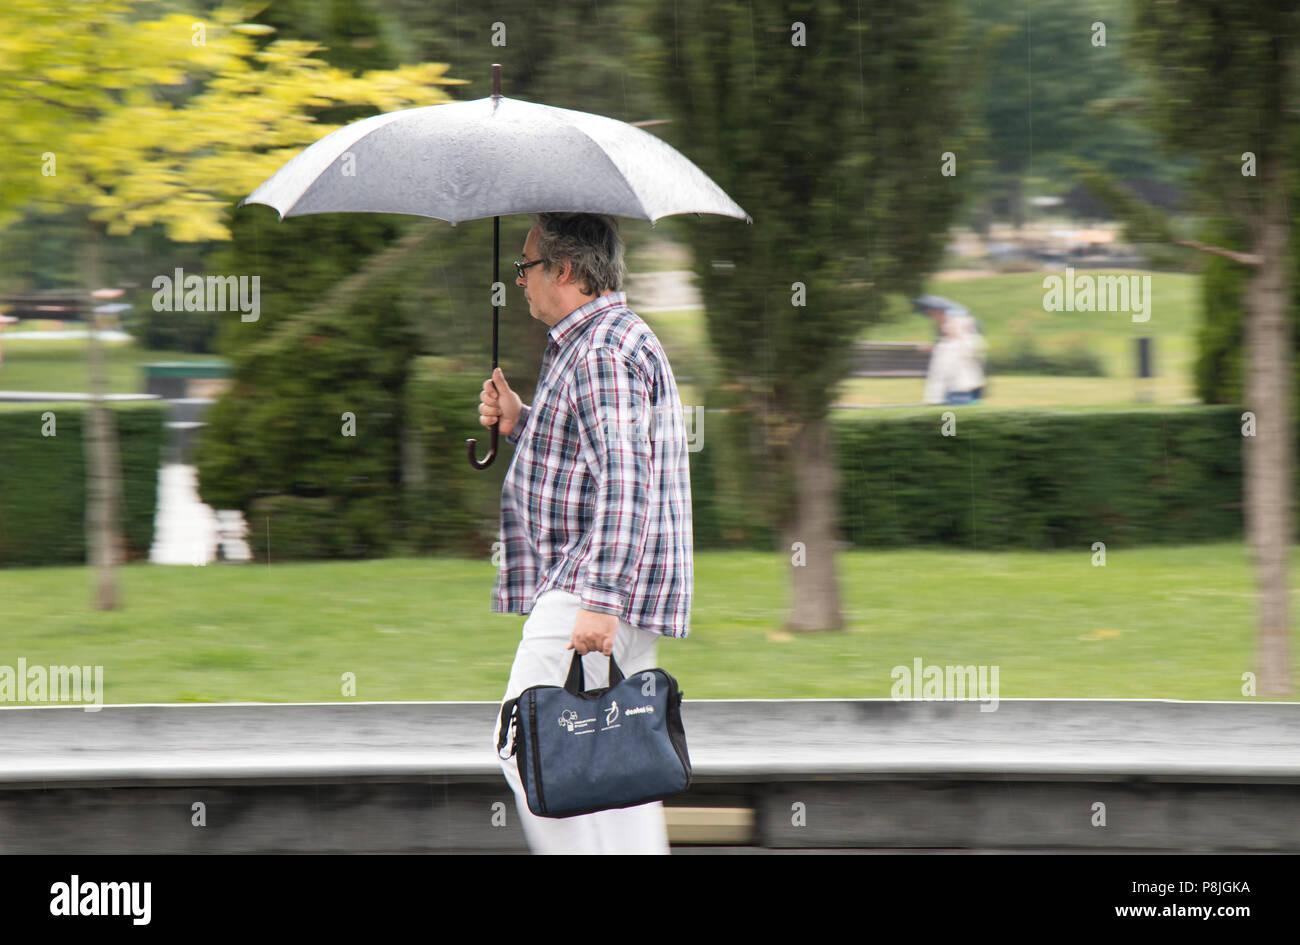 aa1eb069fef7 Man Umbrella Briefcase In Rain Photos   Man Umbrella Briefcase In ...